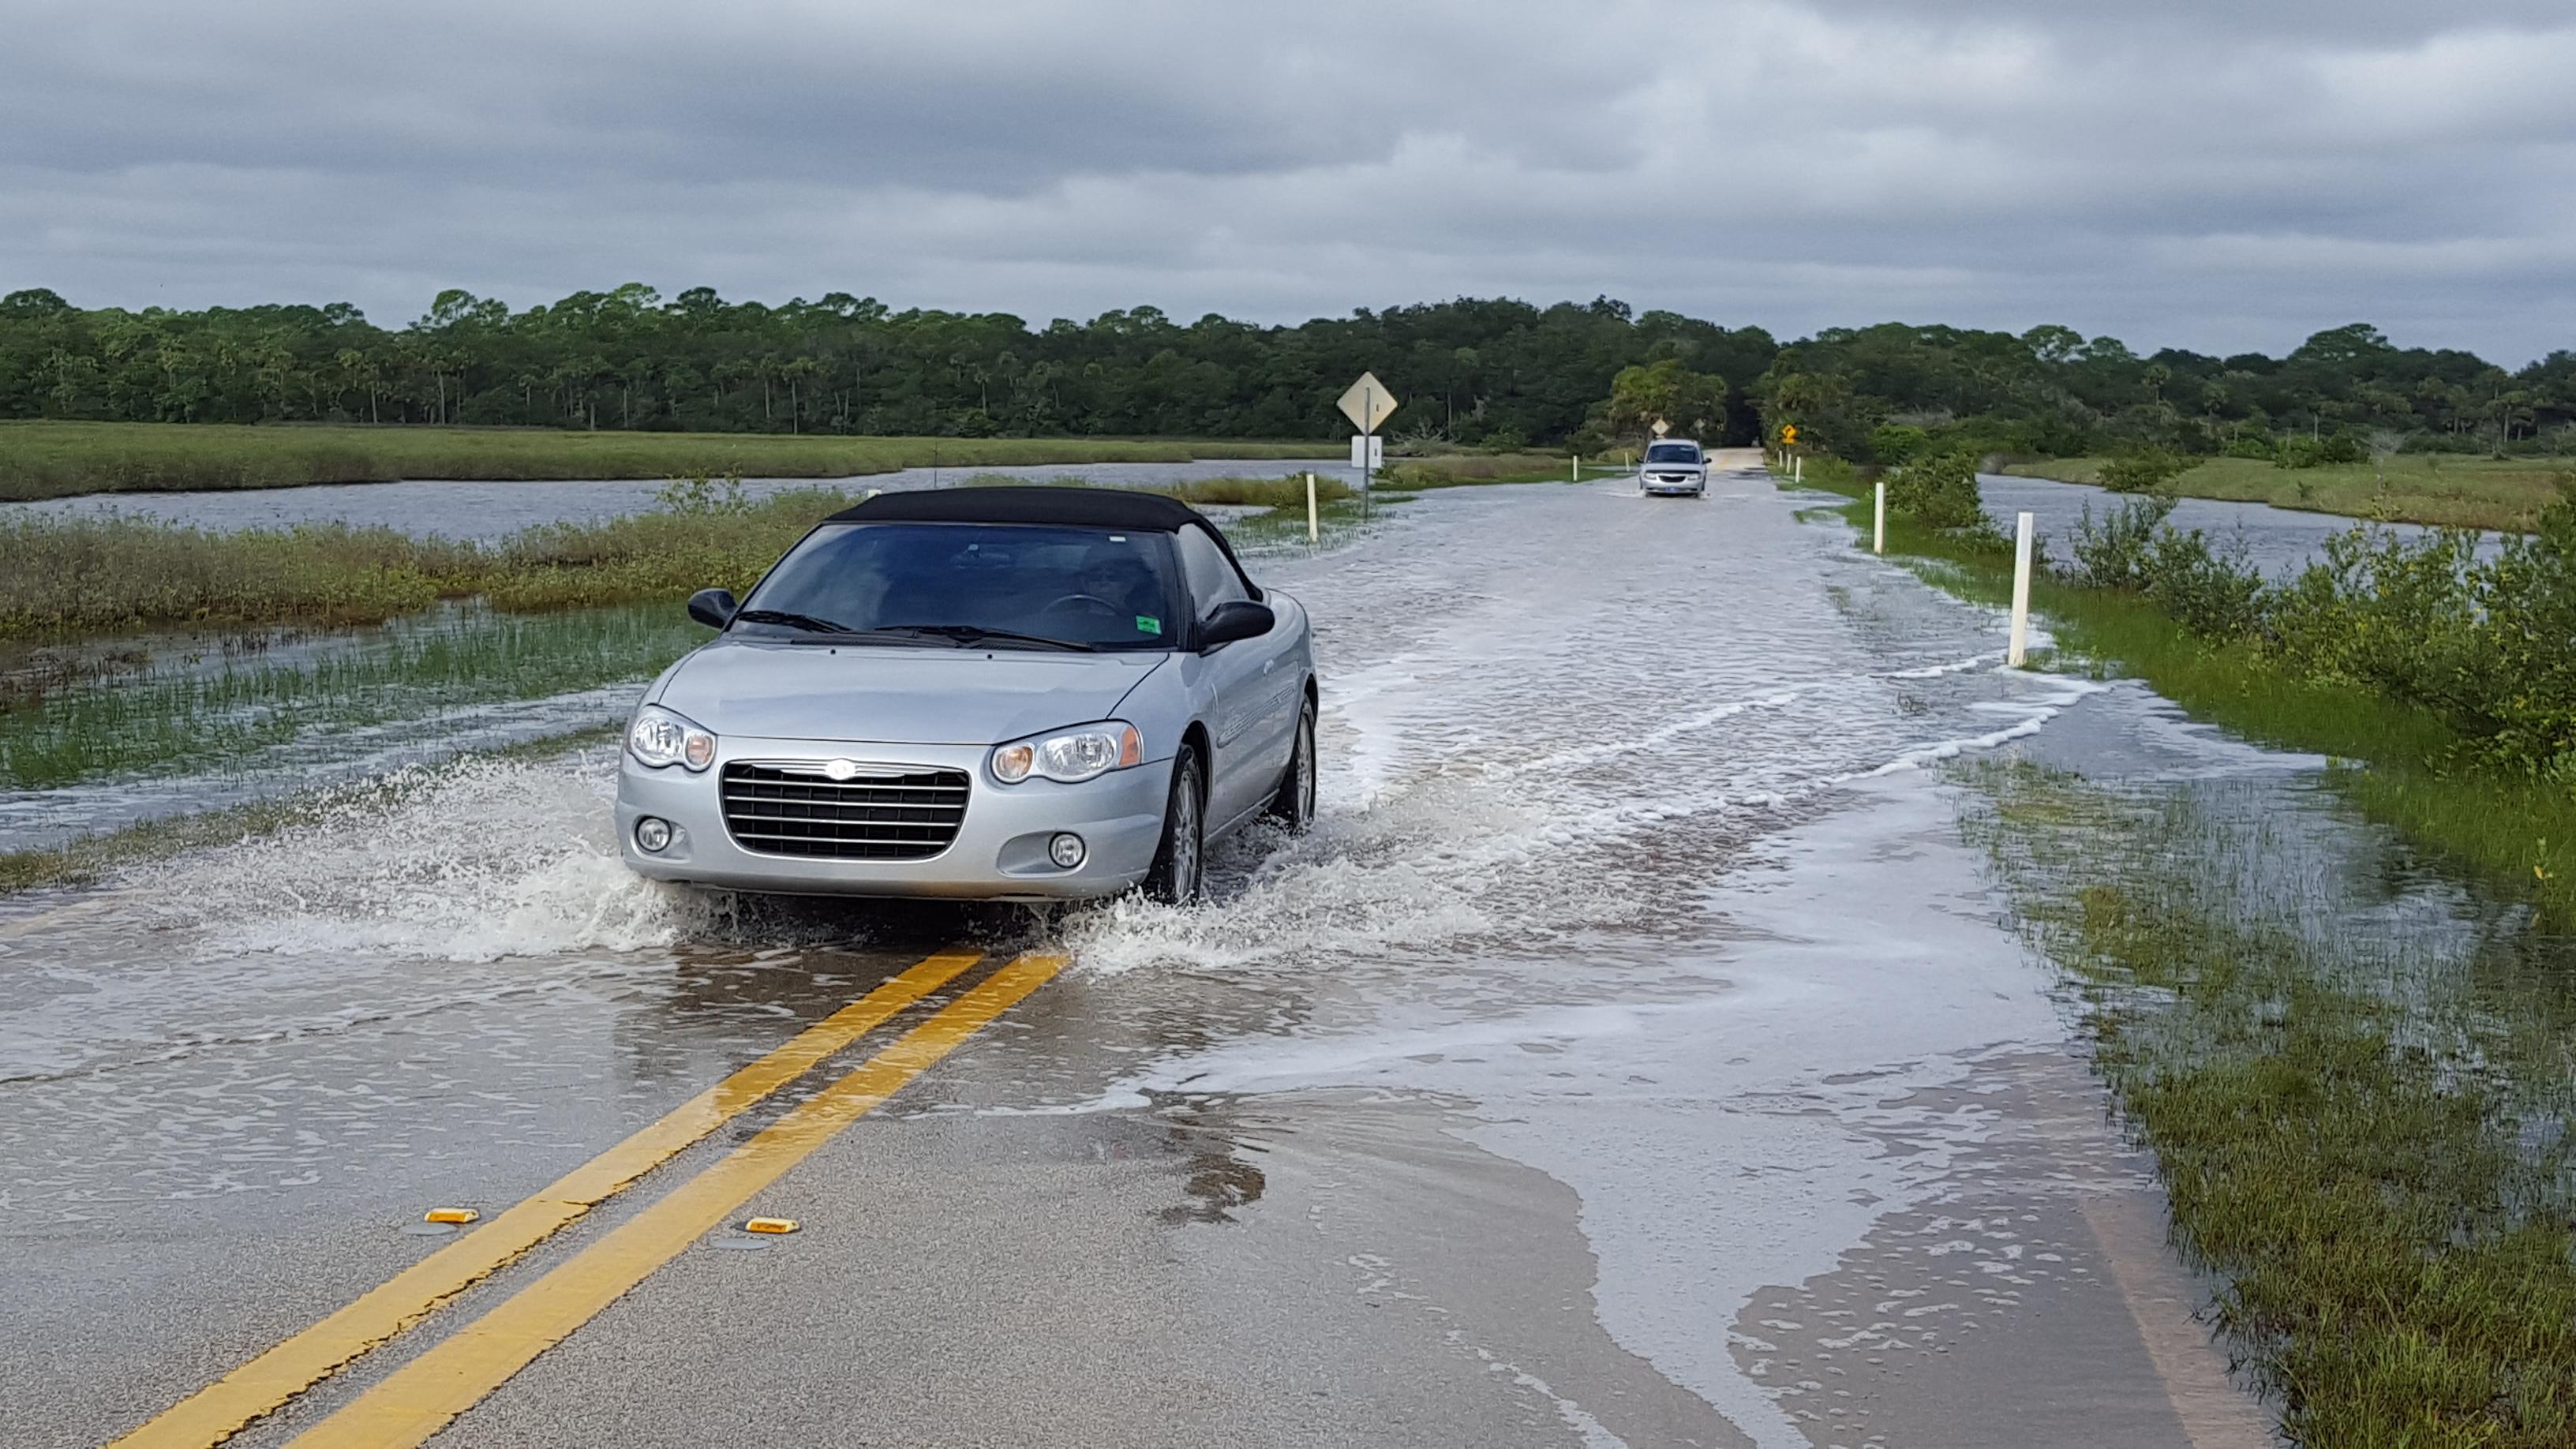 Flooding Nuisance Tomoka SP 10.06.2015